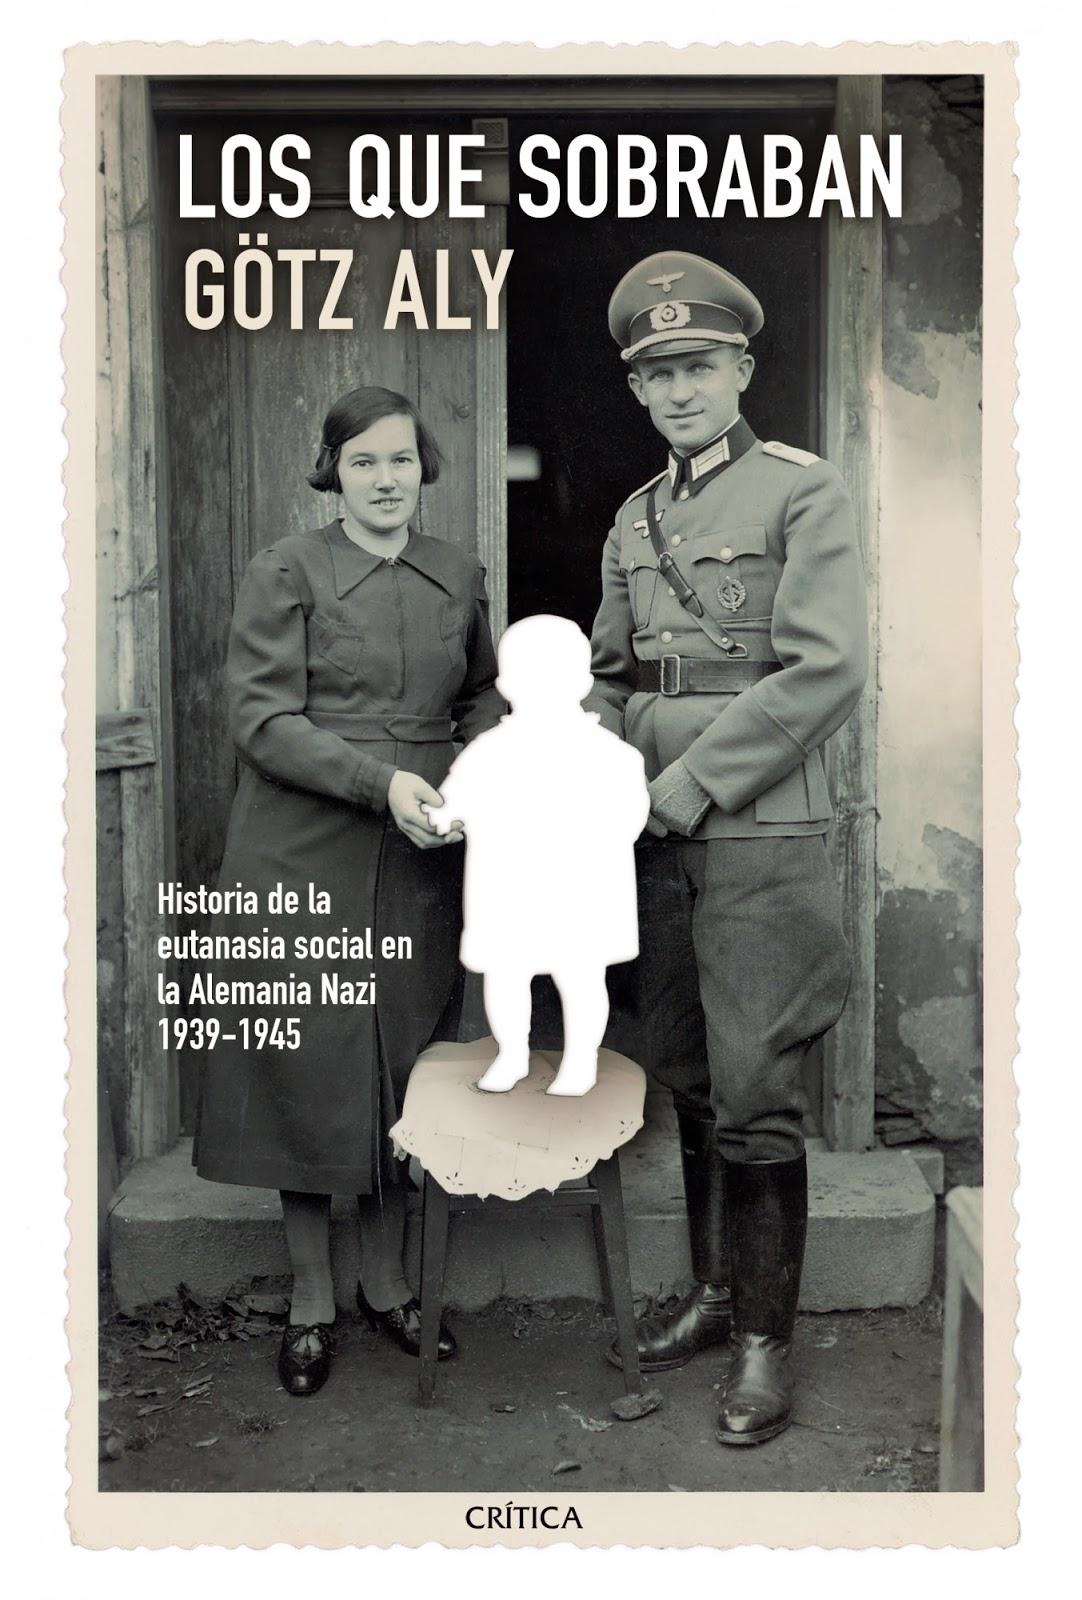 Gotz Aly